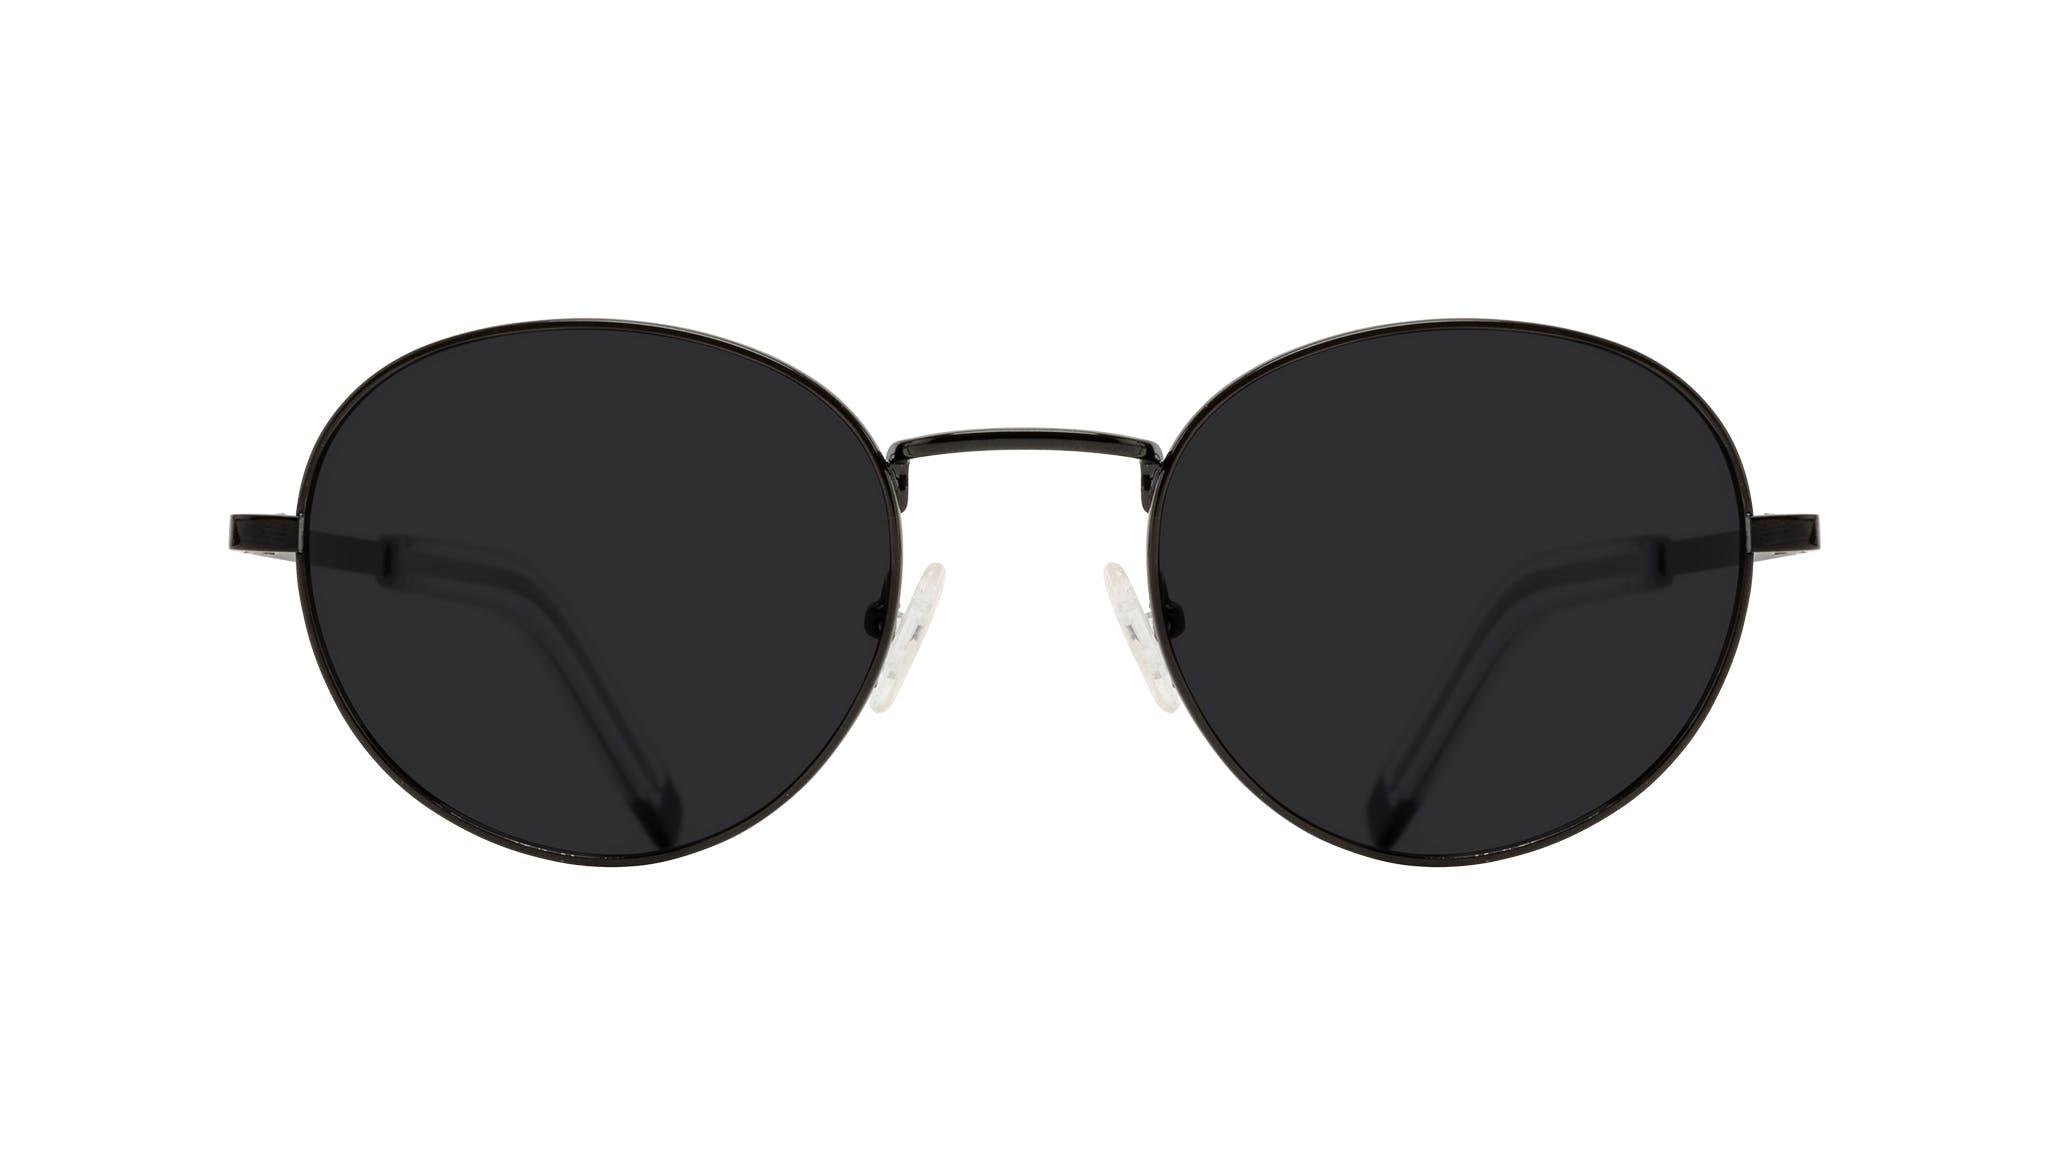 Affordable Fashion Glasses Round Sunglasses Men Lean XL Black